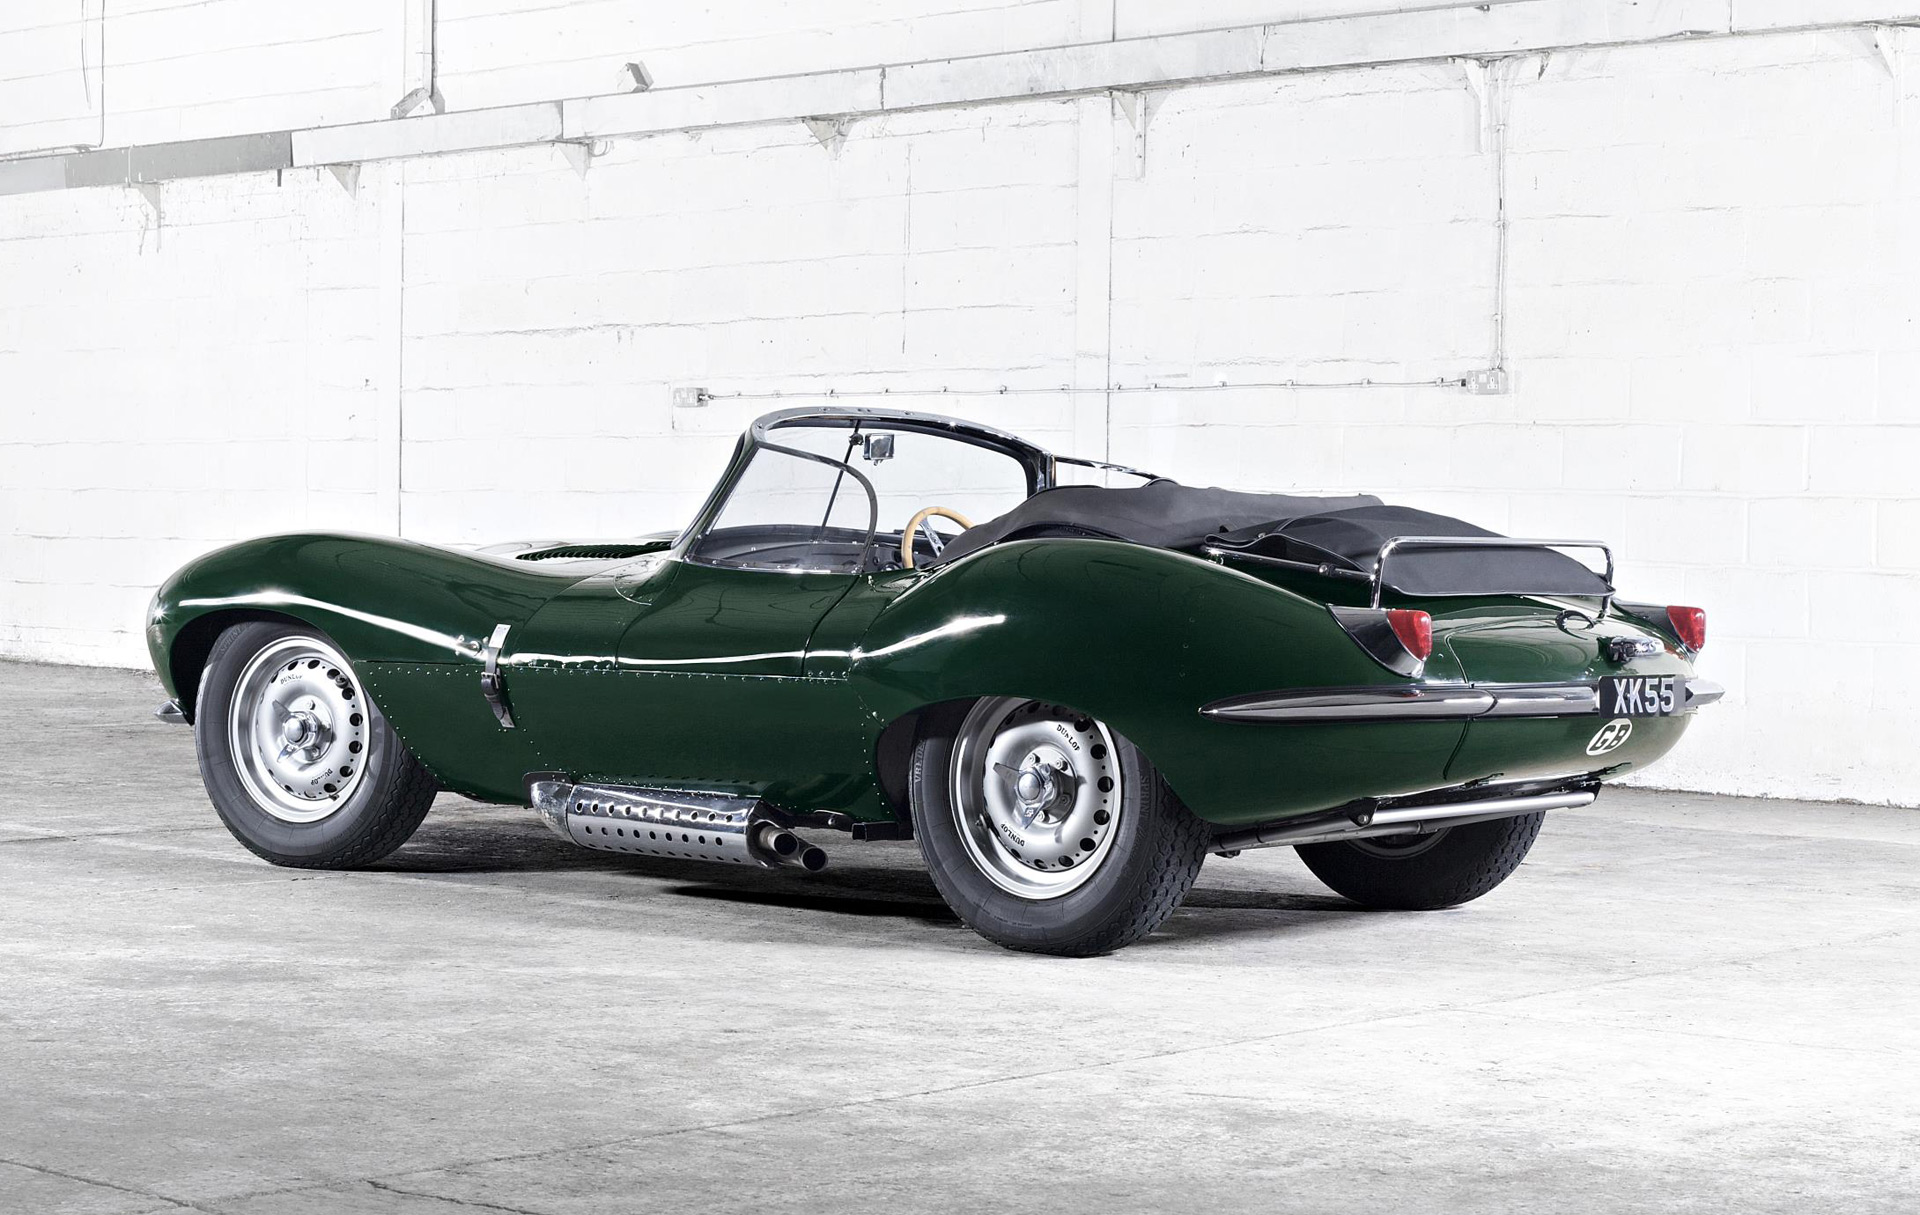 aston martin db11 orders, more mercedes-amg models, jaguar xkss